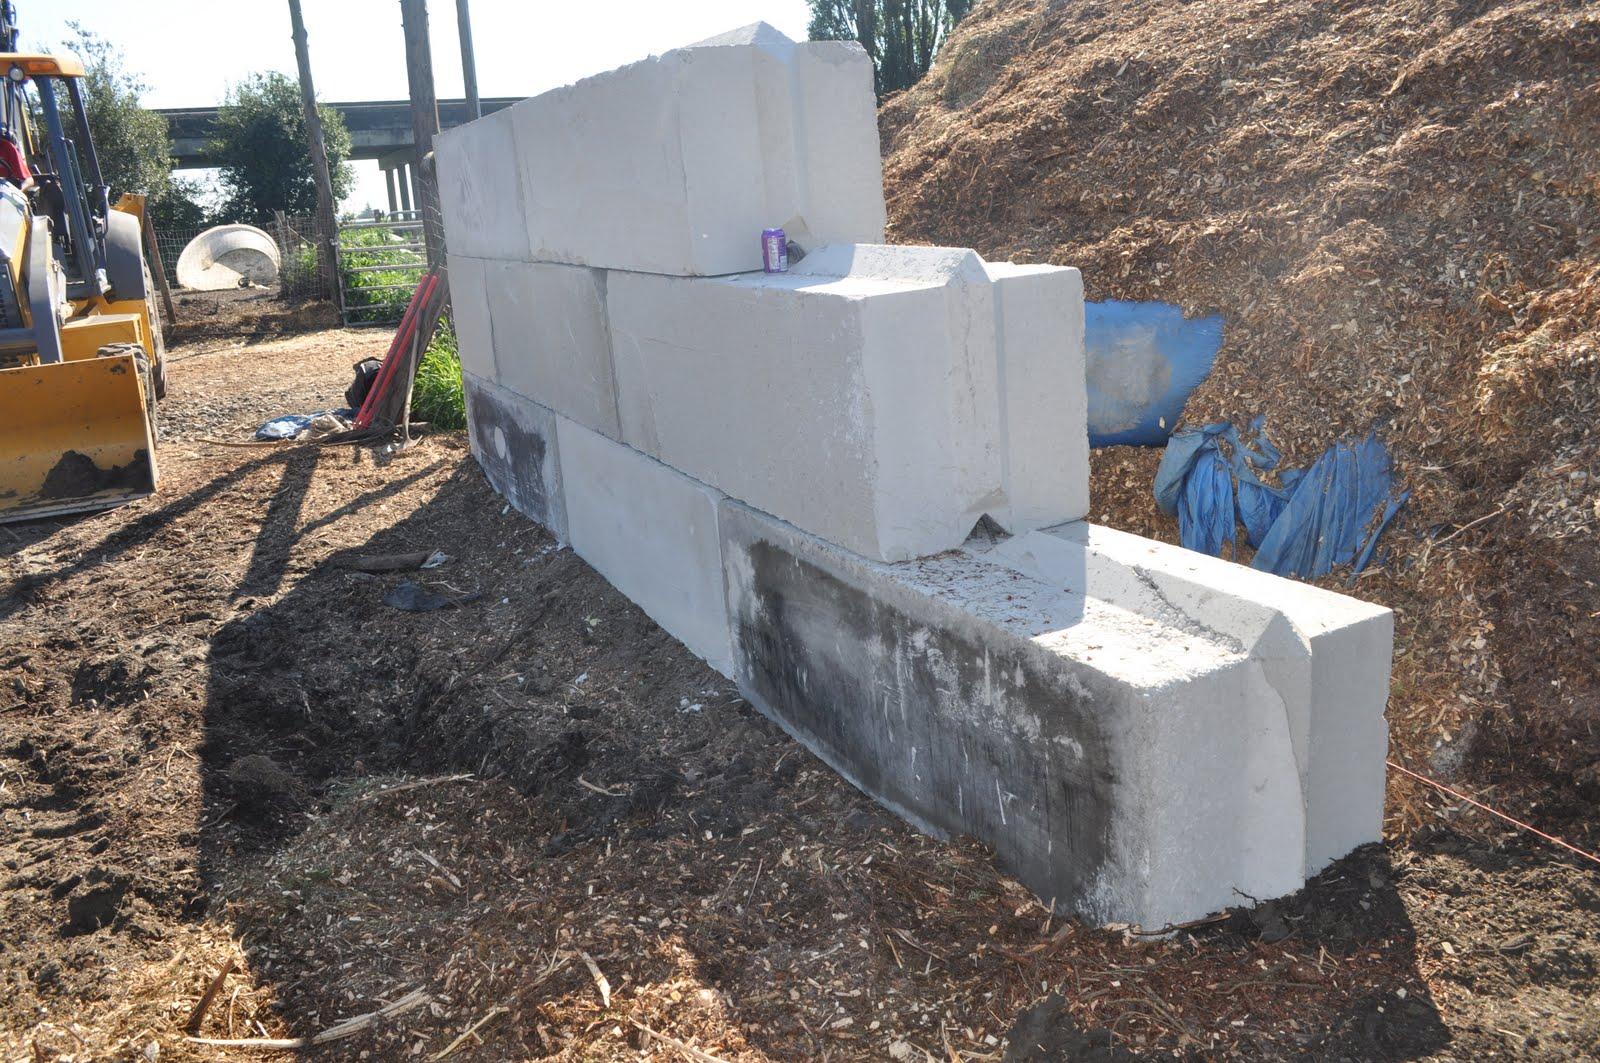 Retaining wall mafia block gravity wall ar15 com - Craigslist little rock farm and garden ...